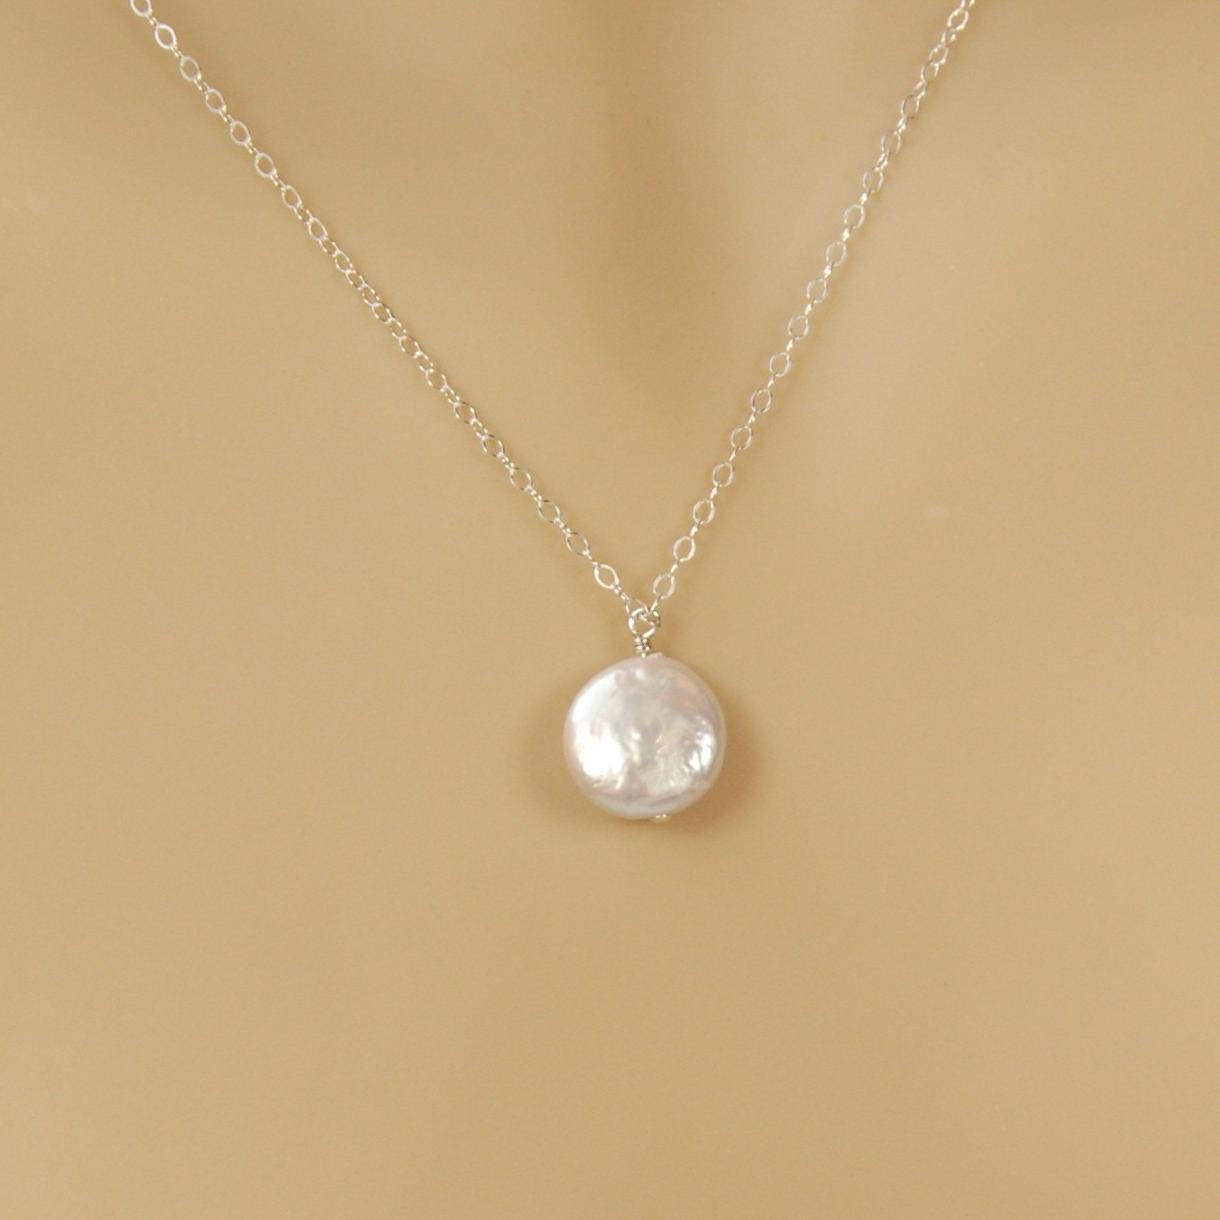 Bridal Necklace - Single Coin